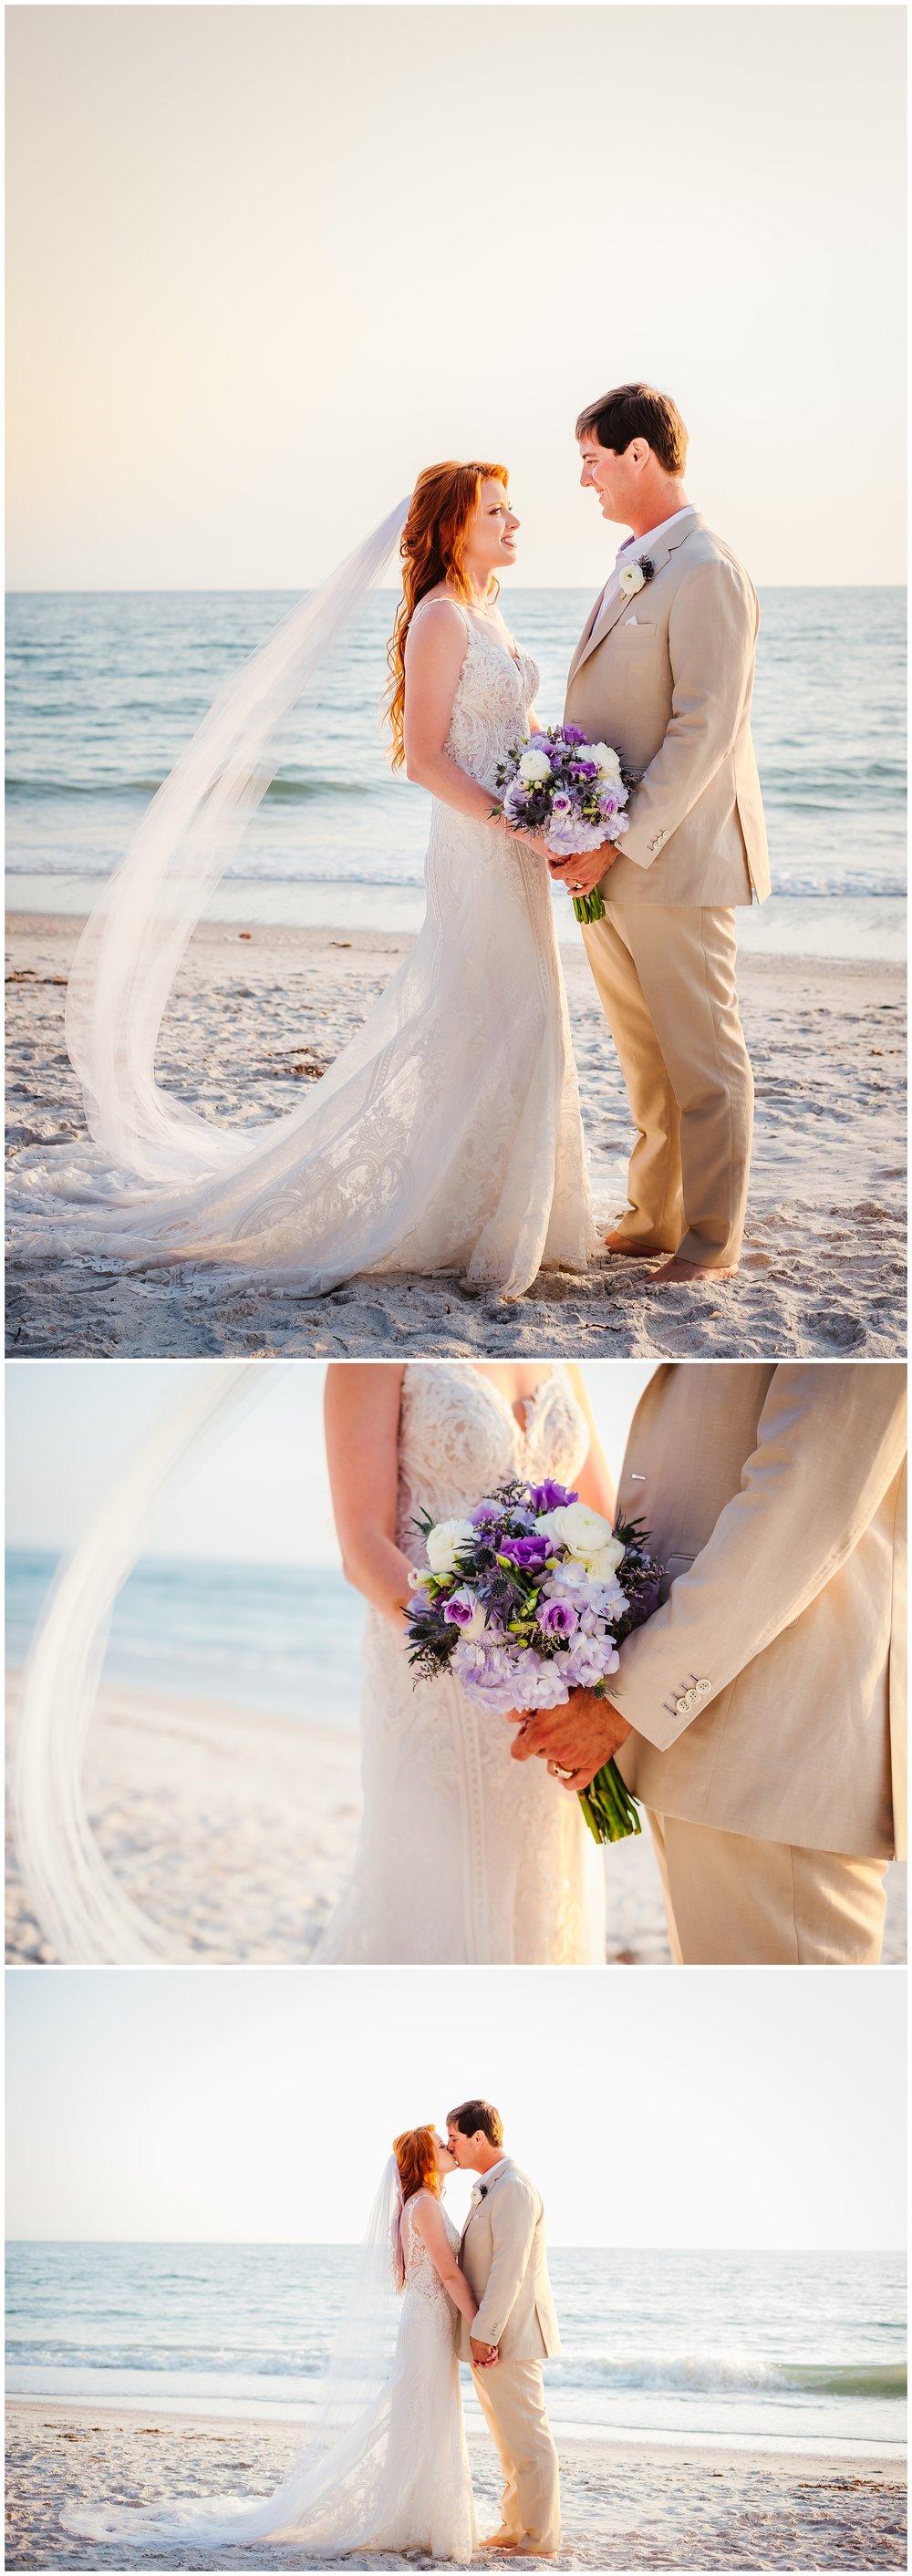 tampa-st-pete-wedding-photographer-indian-rocks-beach-mermaid-train-redhead_0156.jpg